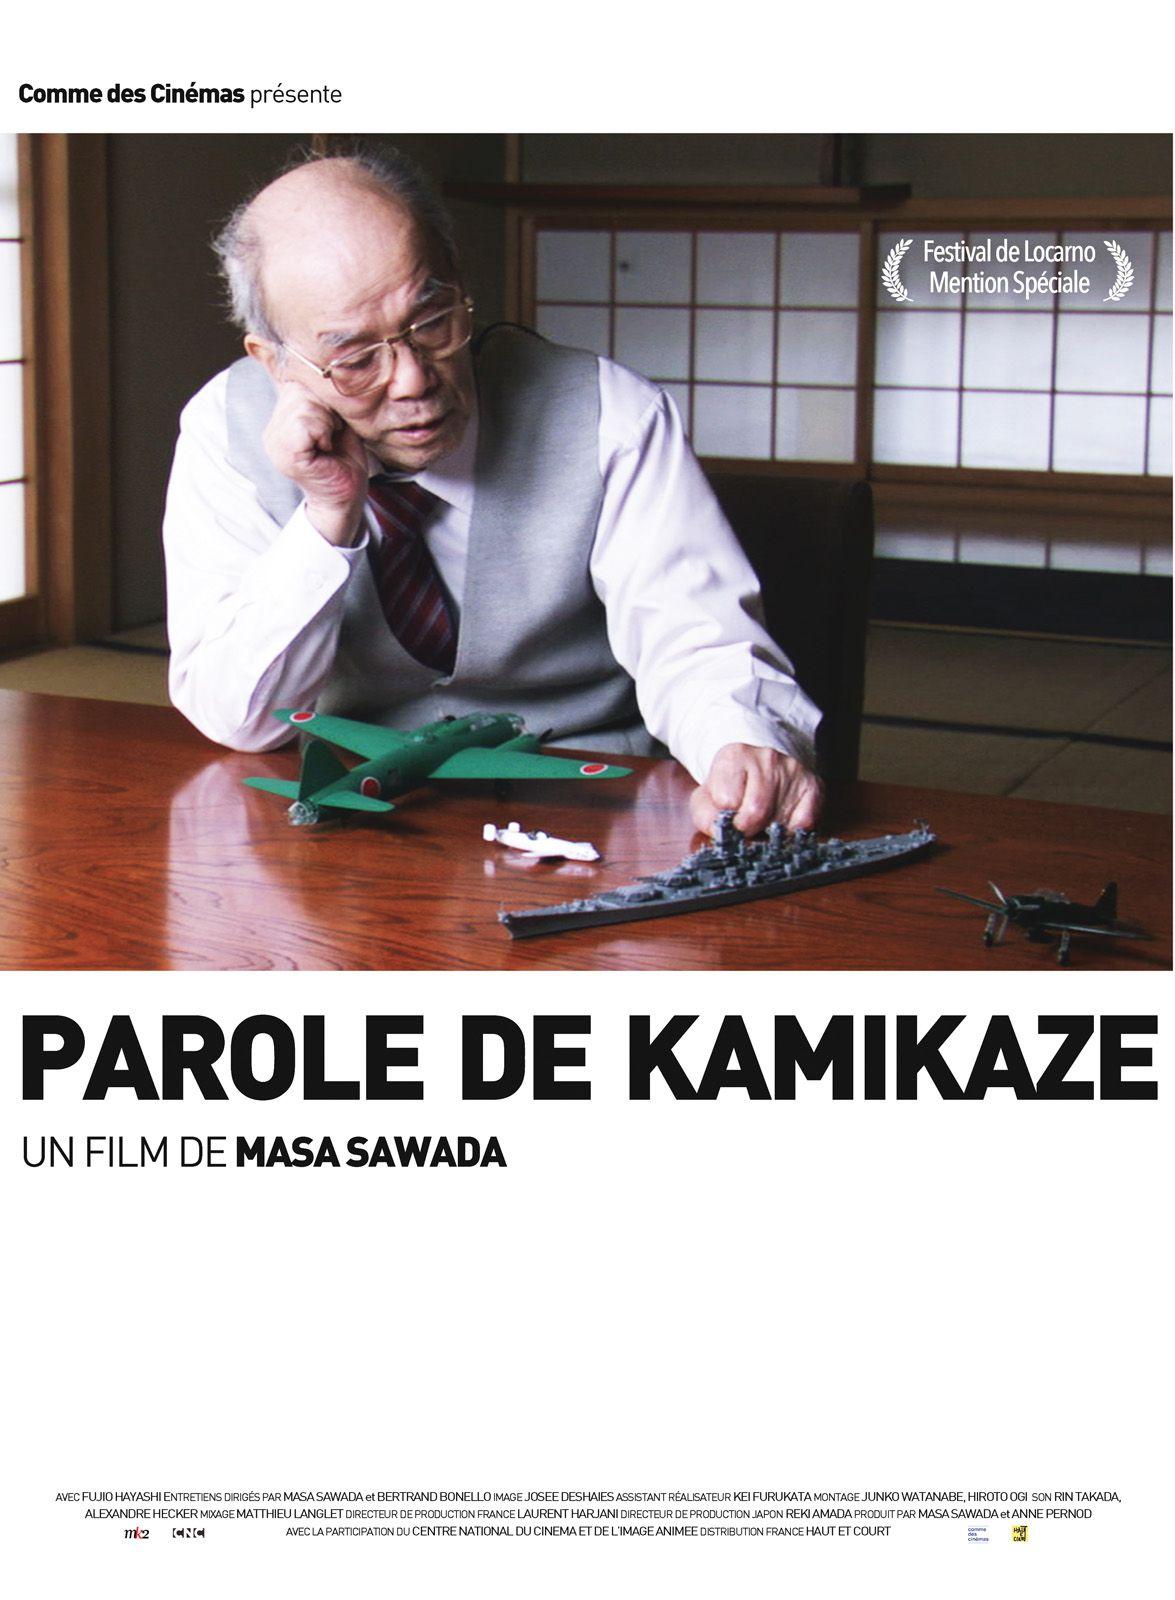 Parole de kamikaze - Documentaire (2014)